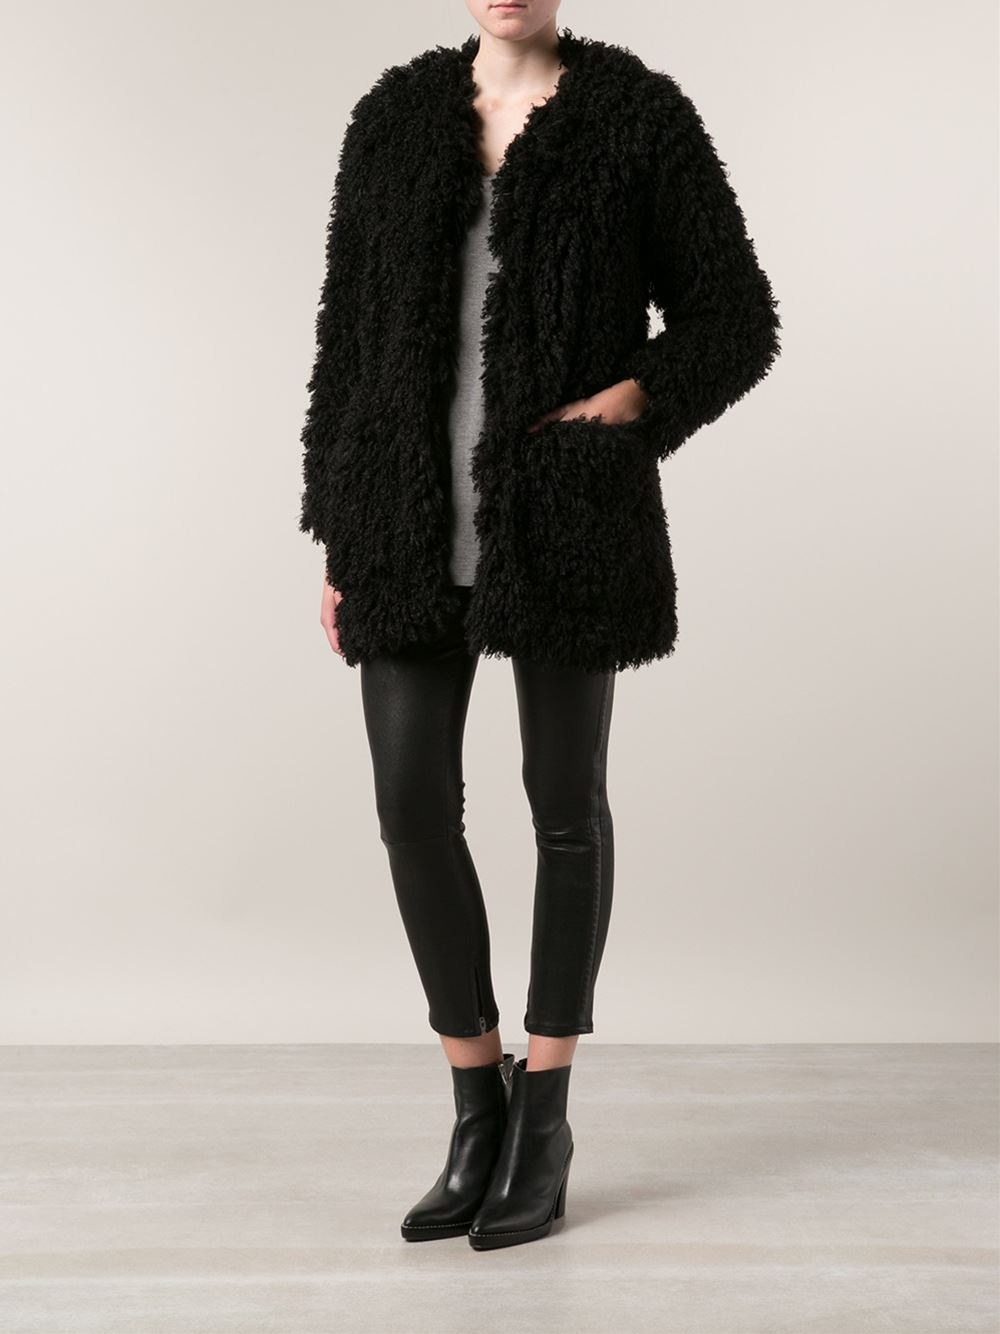 Smythe Fuzzy Jacket In Black Lyst